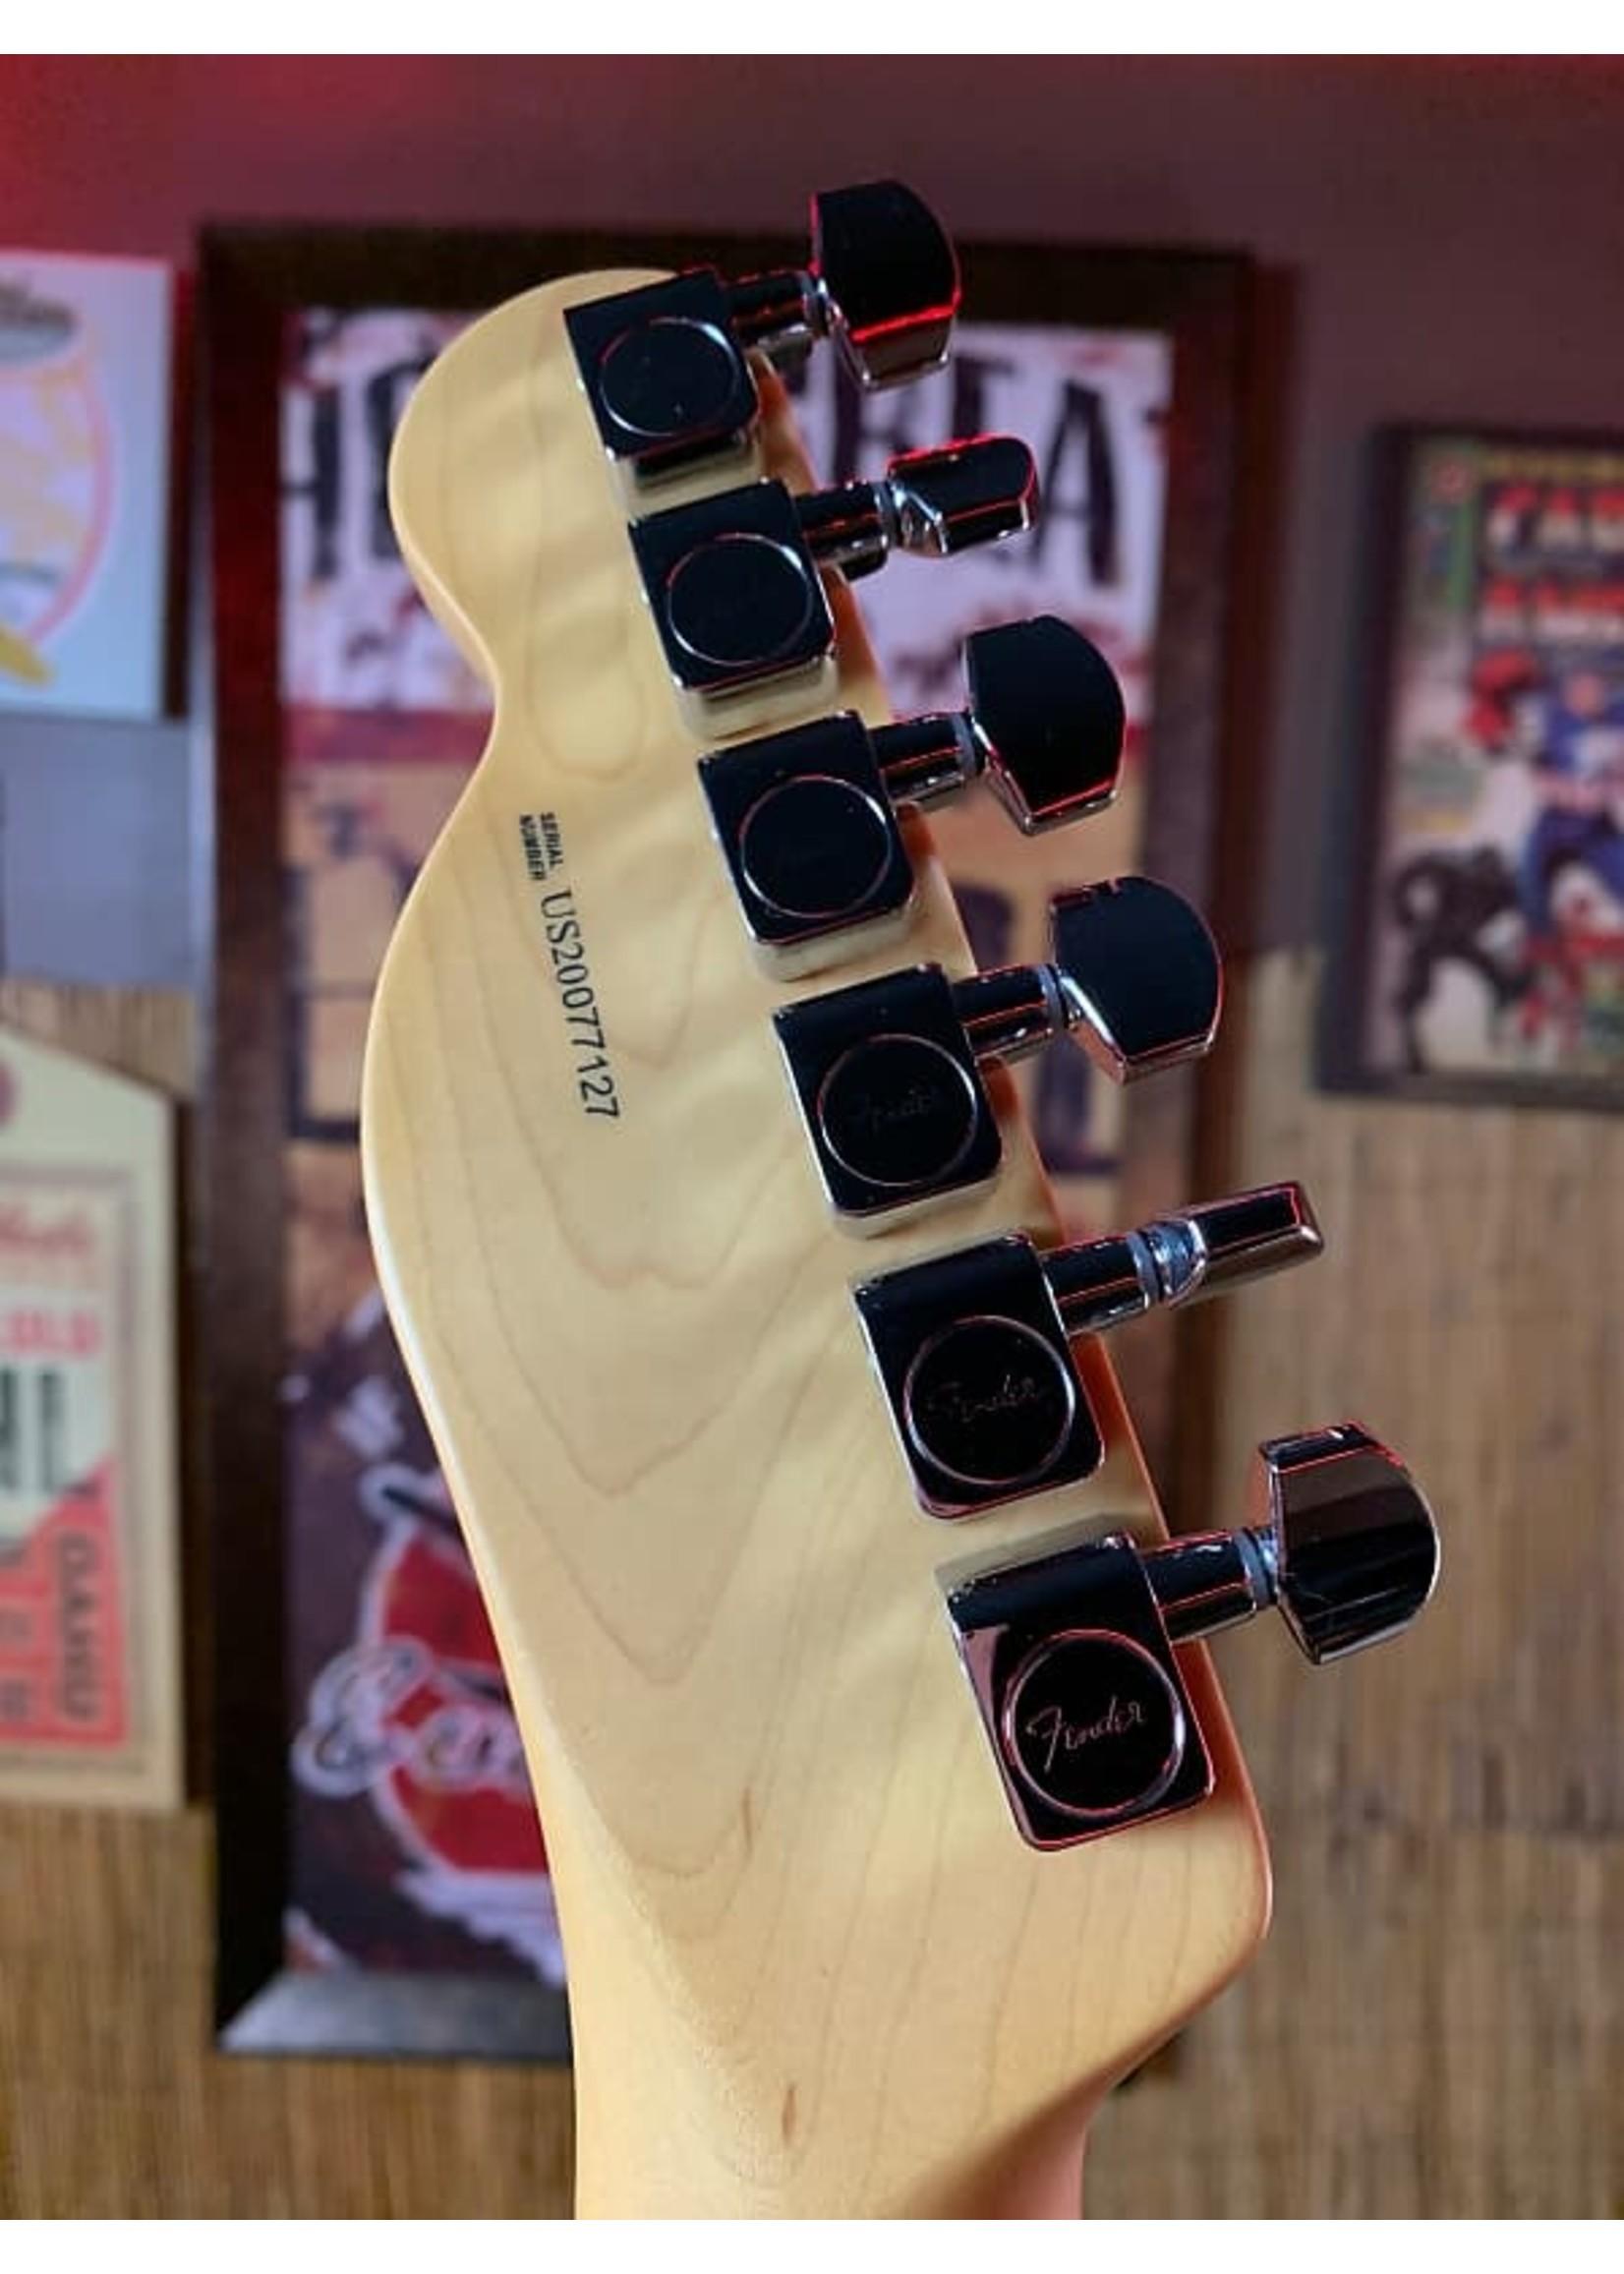 Fender Fender American Professional II Telecaster in Roasted Pine